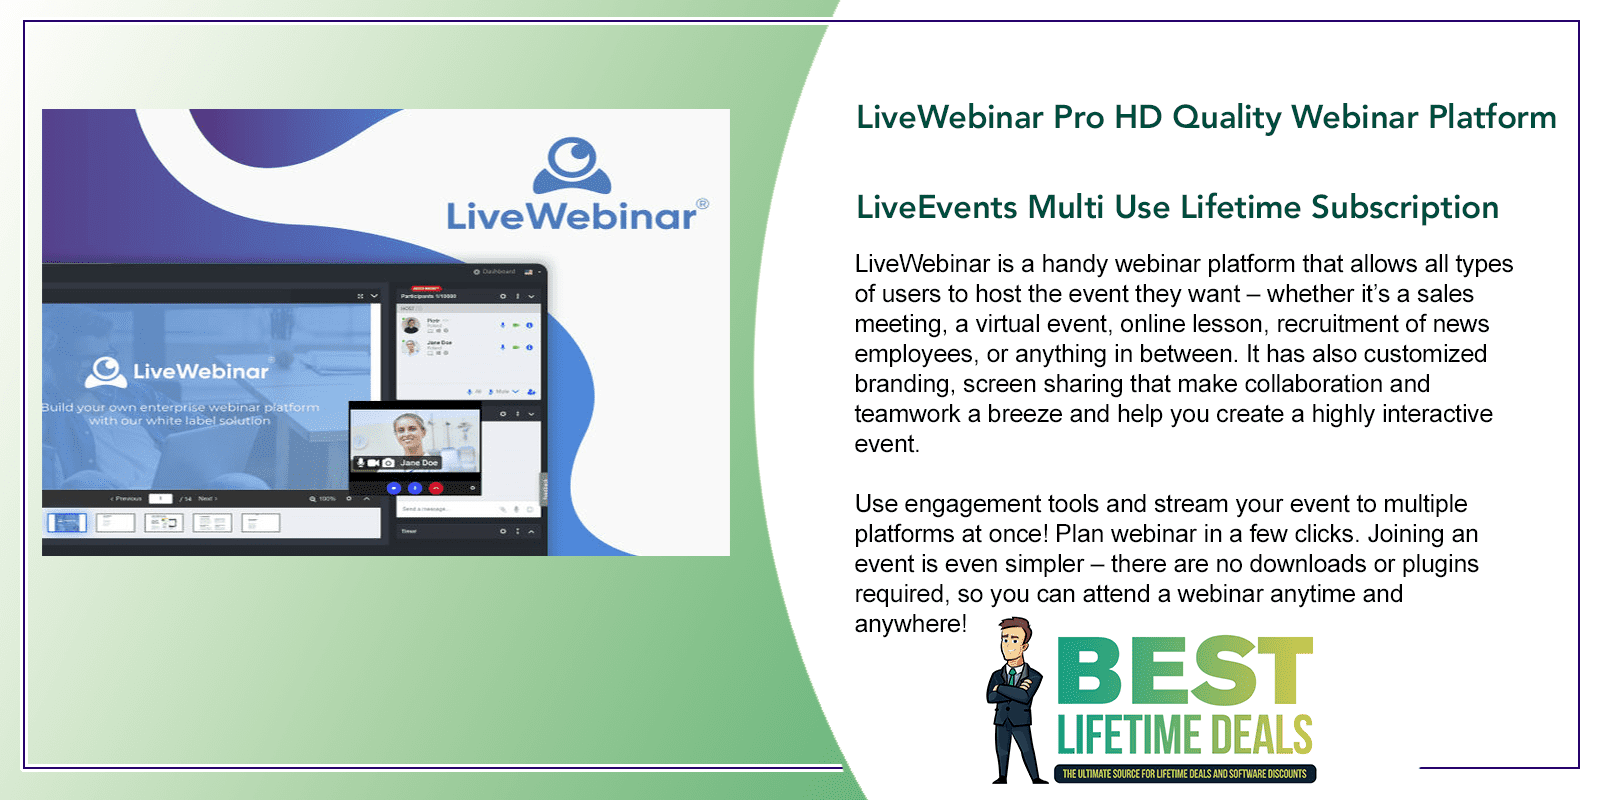 LiveWebinar Pro HD Quality Webinar Platform LiveEvents Multi Use Featured Image